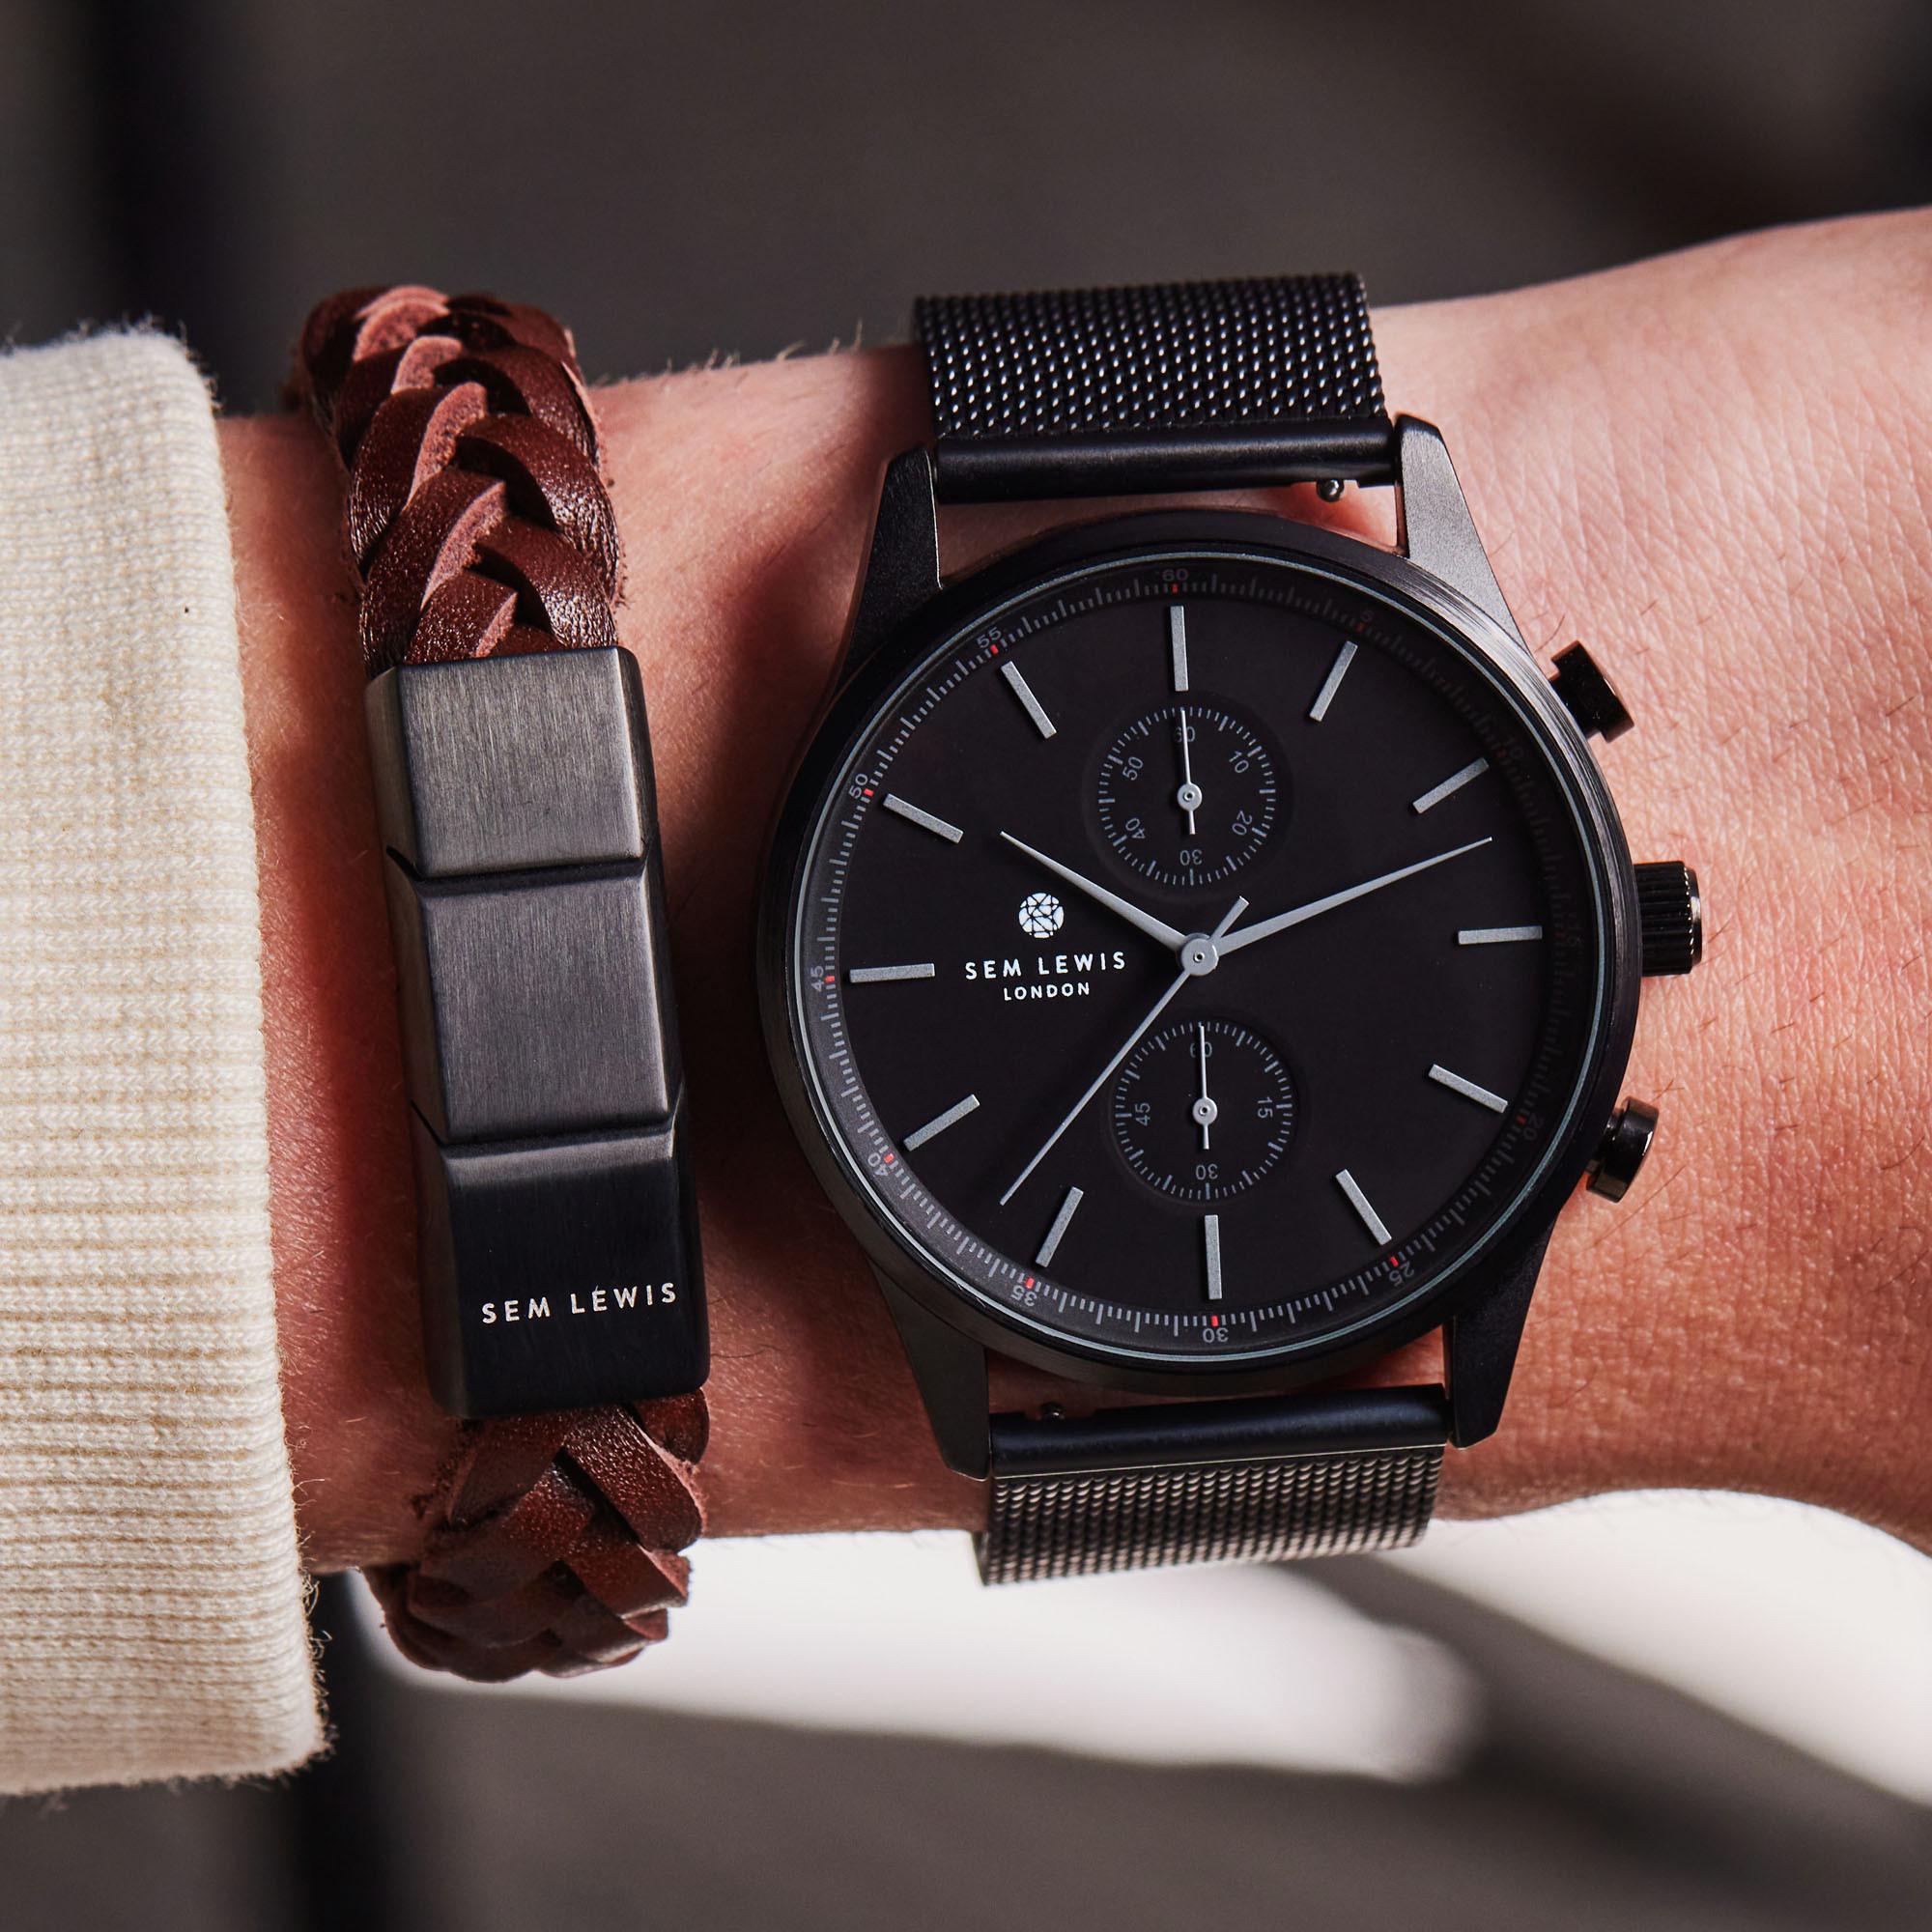 Sem Lewis Metropolitan Northwick Park Horloge en Strap Giftset SL90004